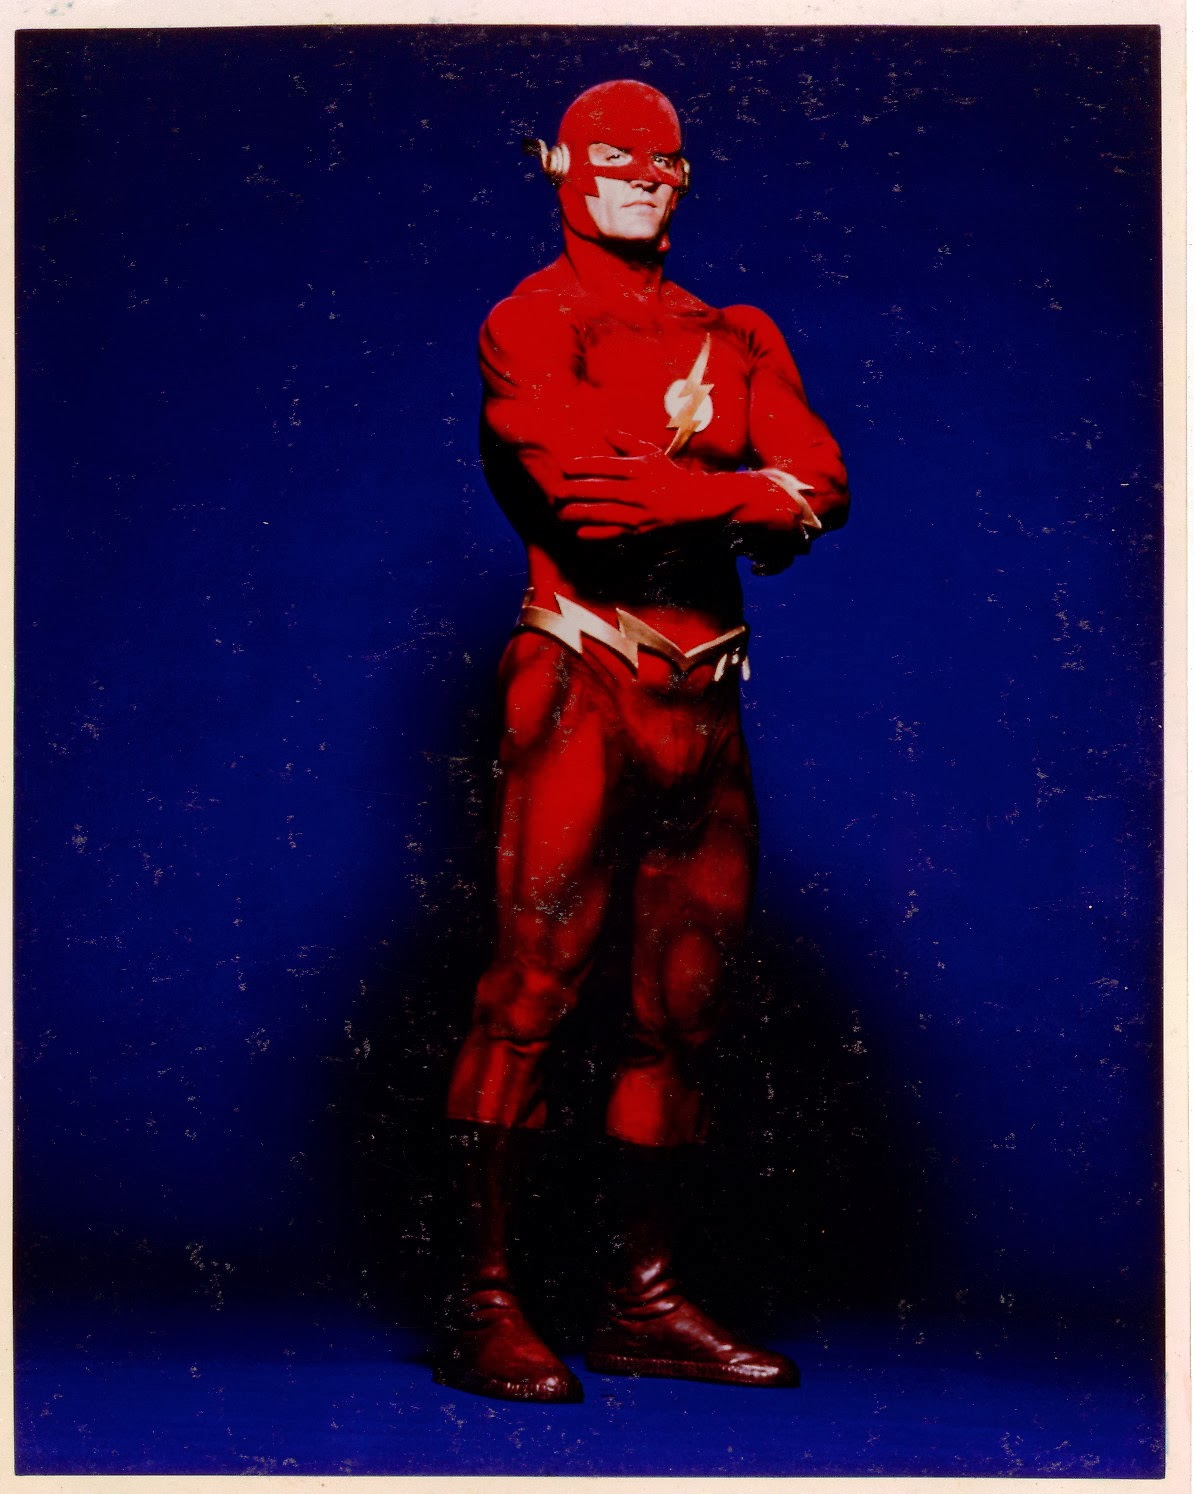 The Flash (The CW) | Arrowverse Wiki | FANDOM powered by Wikia